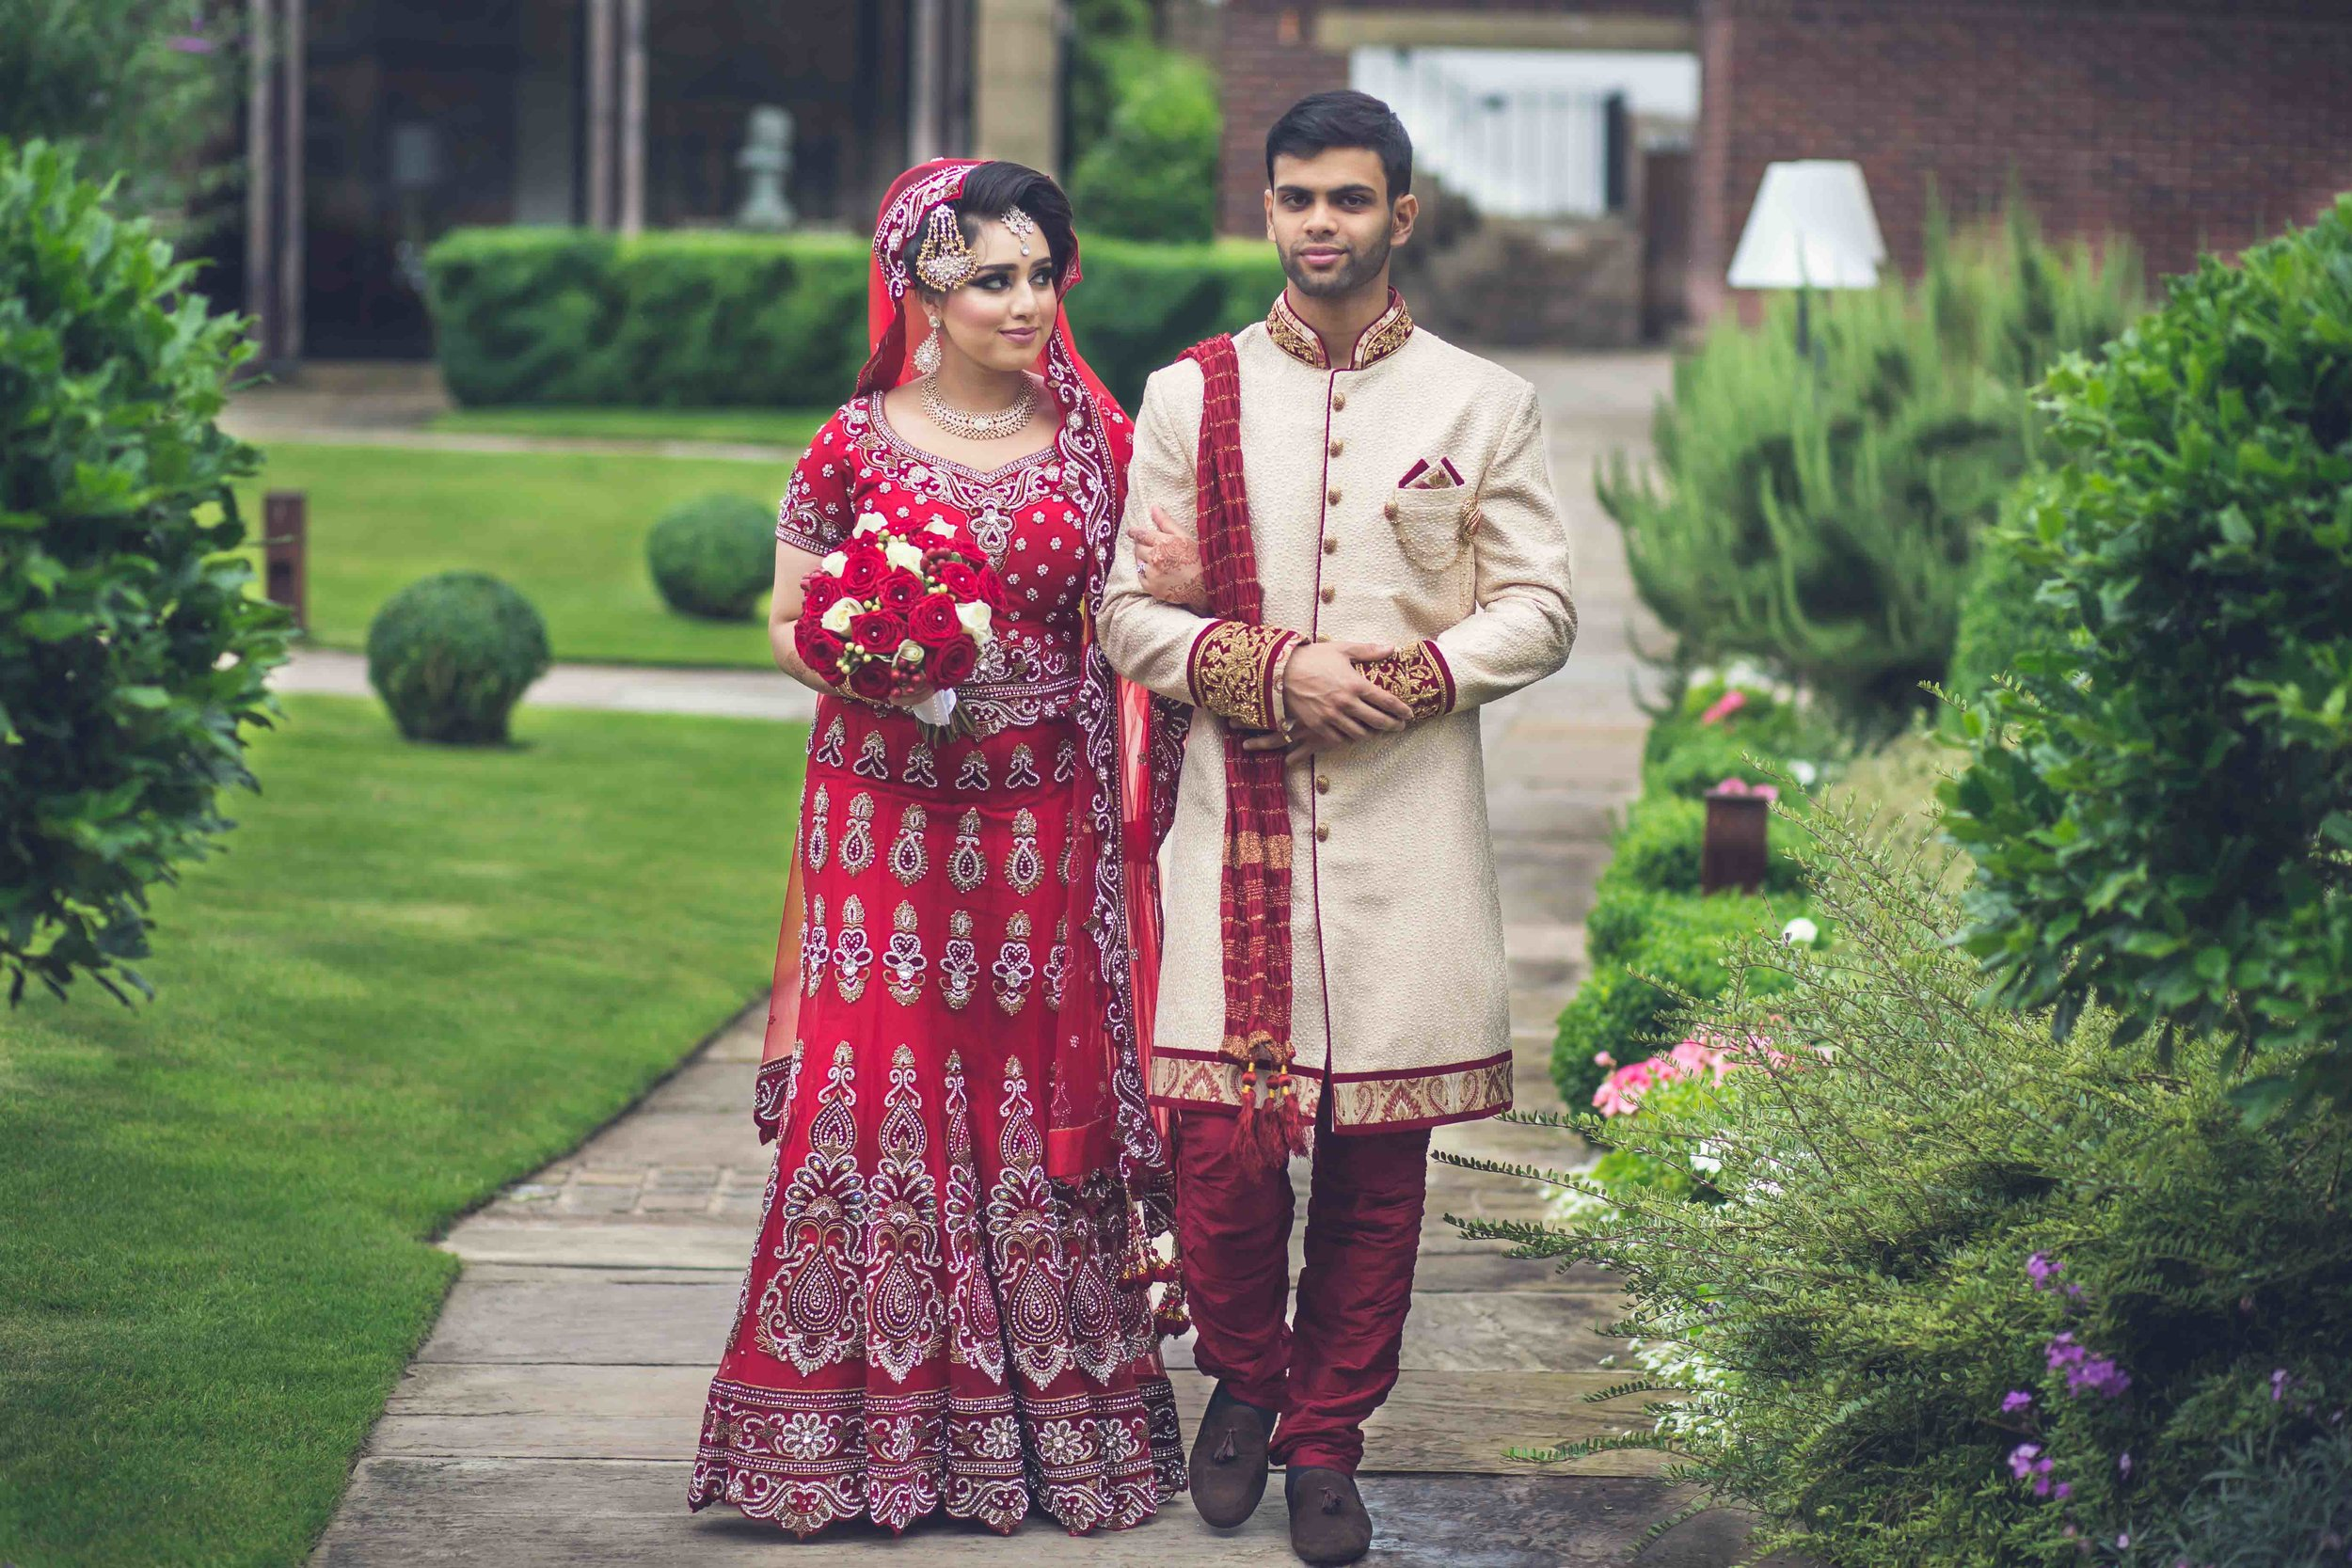 Asian Wedding Photographer Opu Sultan Photography Lyme Park Scotland Edinburgh Glasgow London Manchester Liverpool Birmingham Wedding Photos prewed shoot Jams & Tams Blod-9.jpg